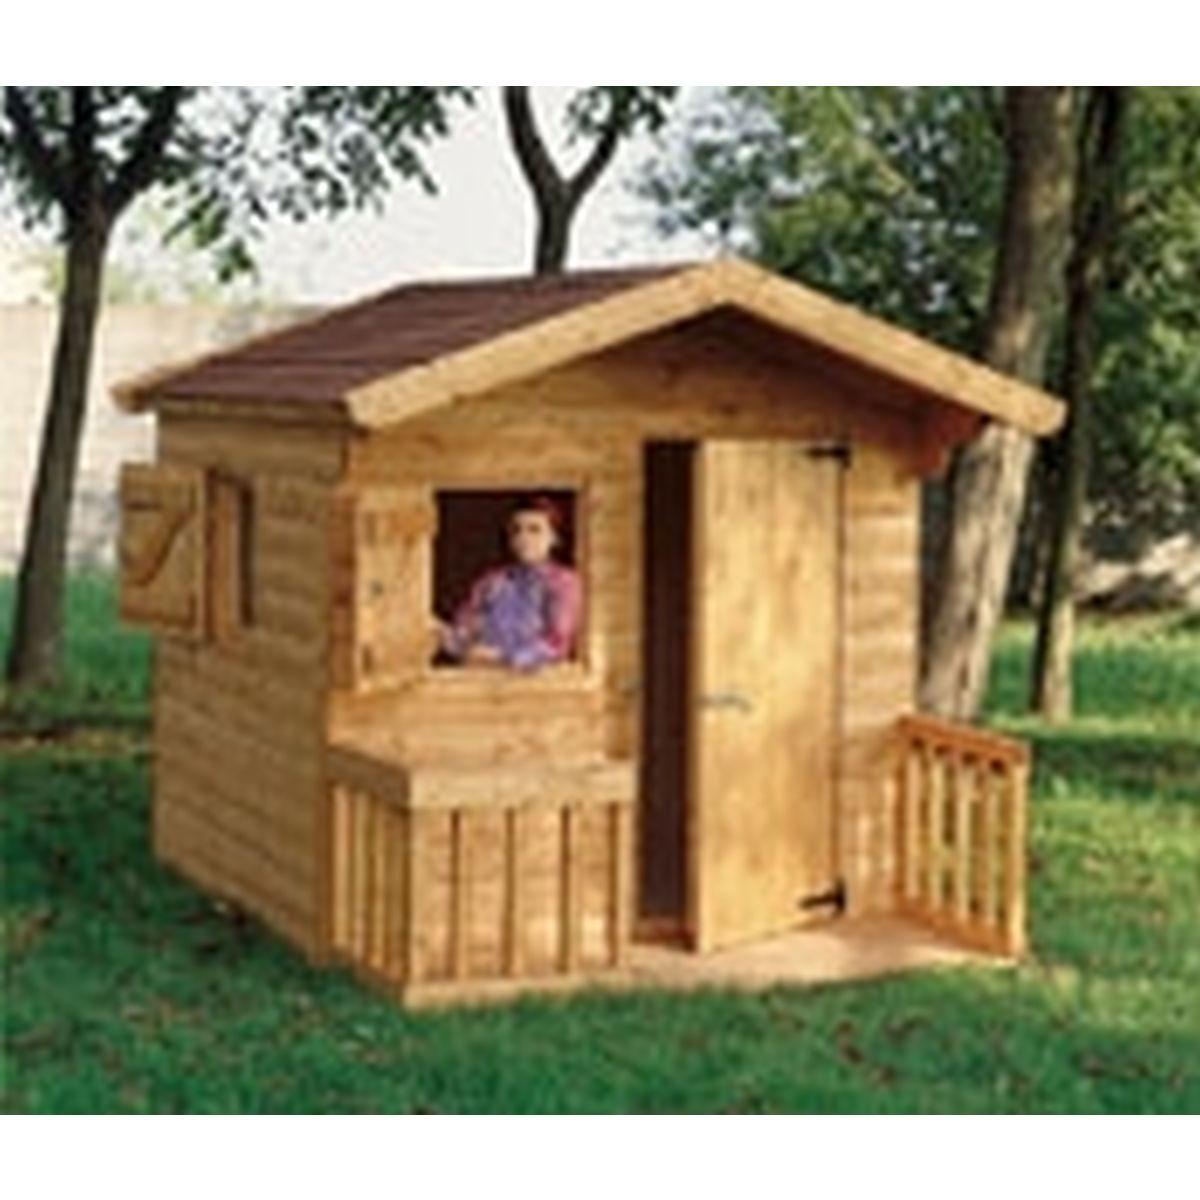 Casetta in legno per bimbi4236 casetta da giardino in - Casette per bimbi da giardino ...